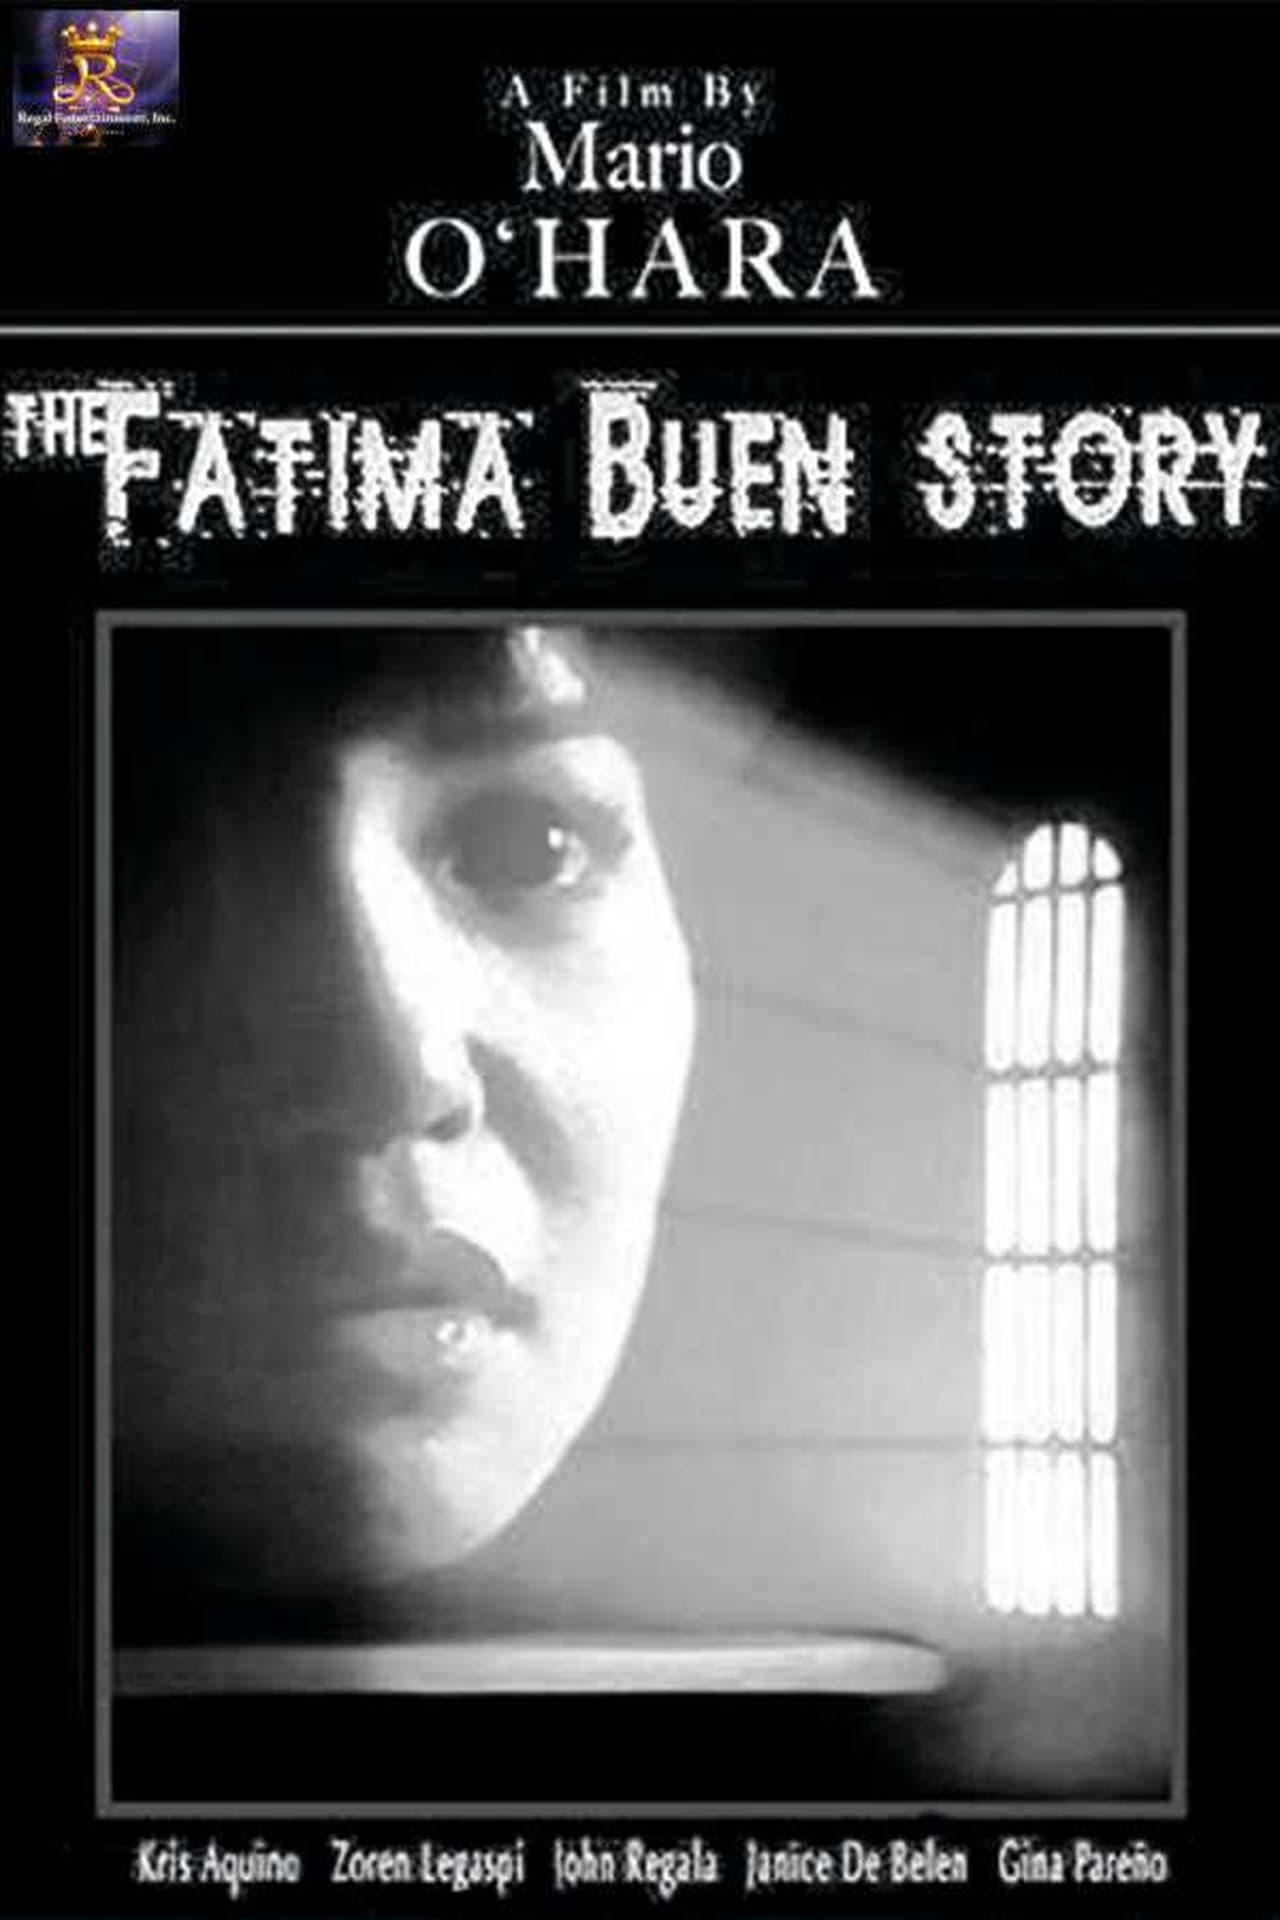 Fatima Buen Story